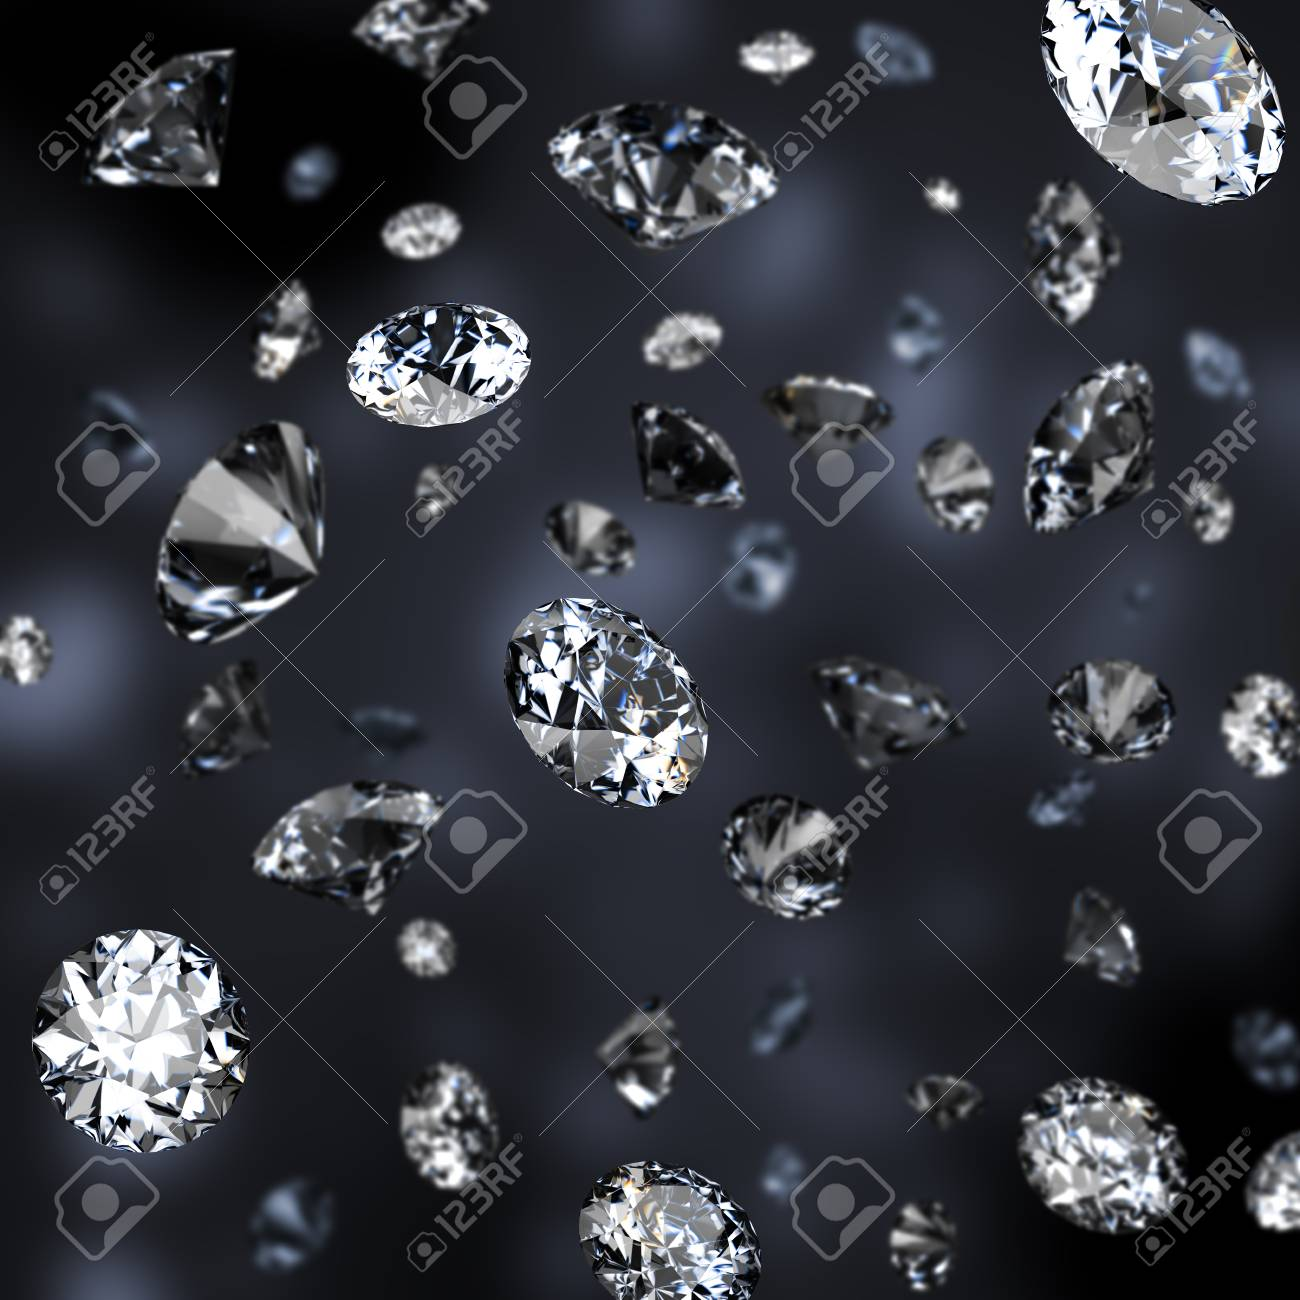 Diamond rain. Dark background. - 90614042